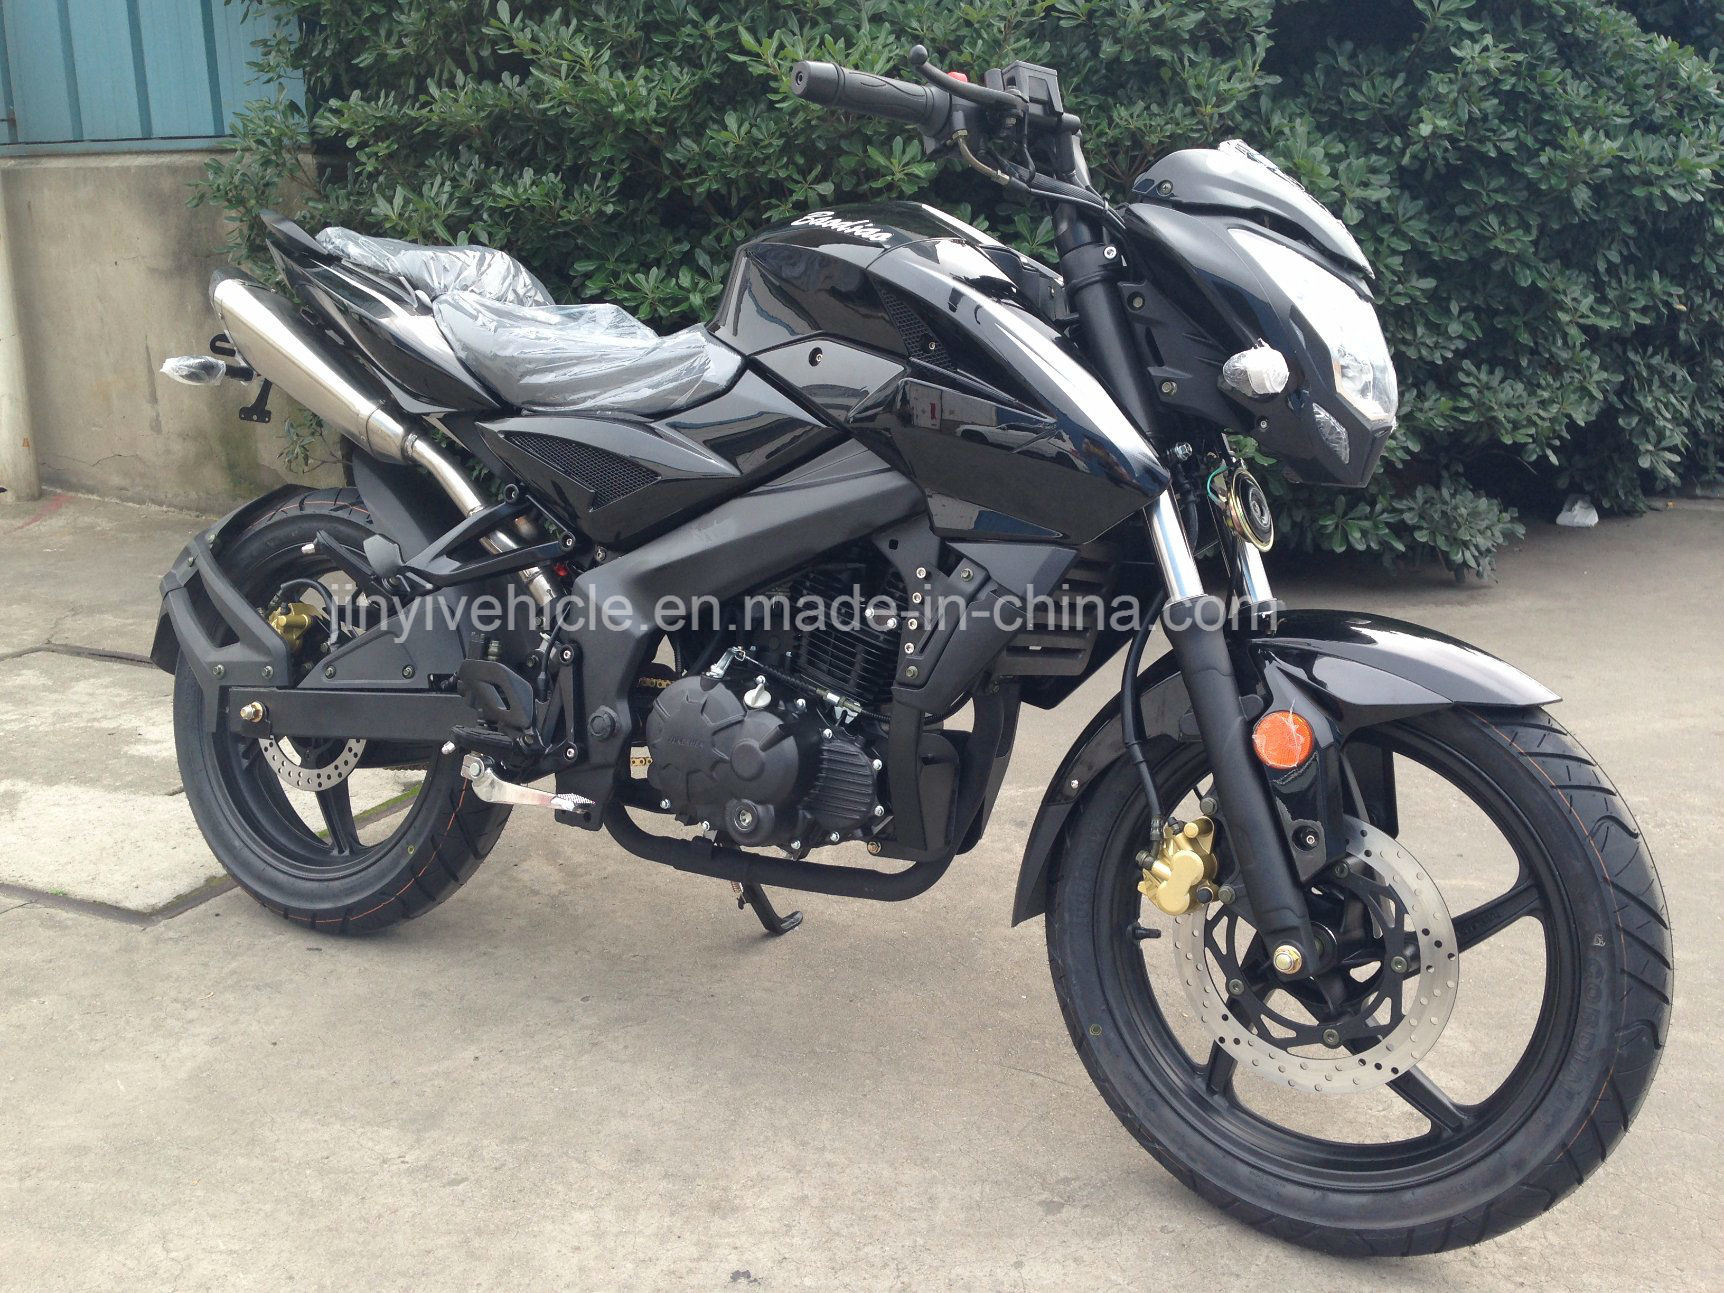 150cc economic Racing Moto with Dual Disk Brakes